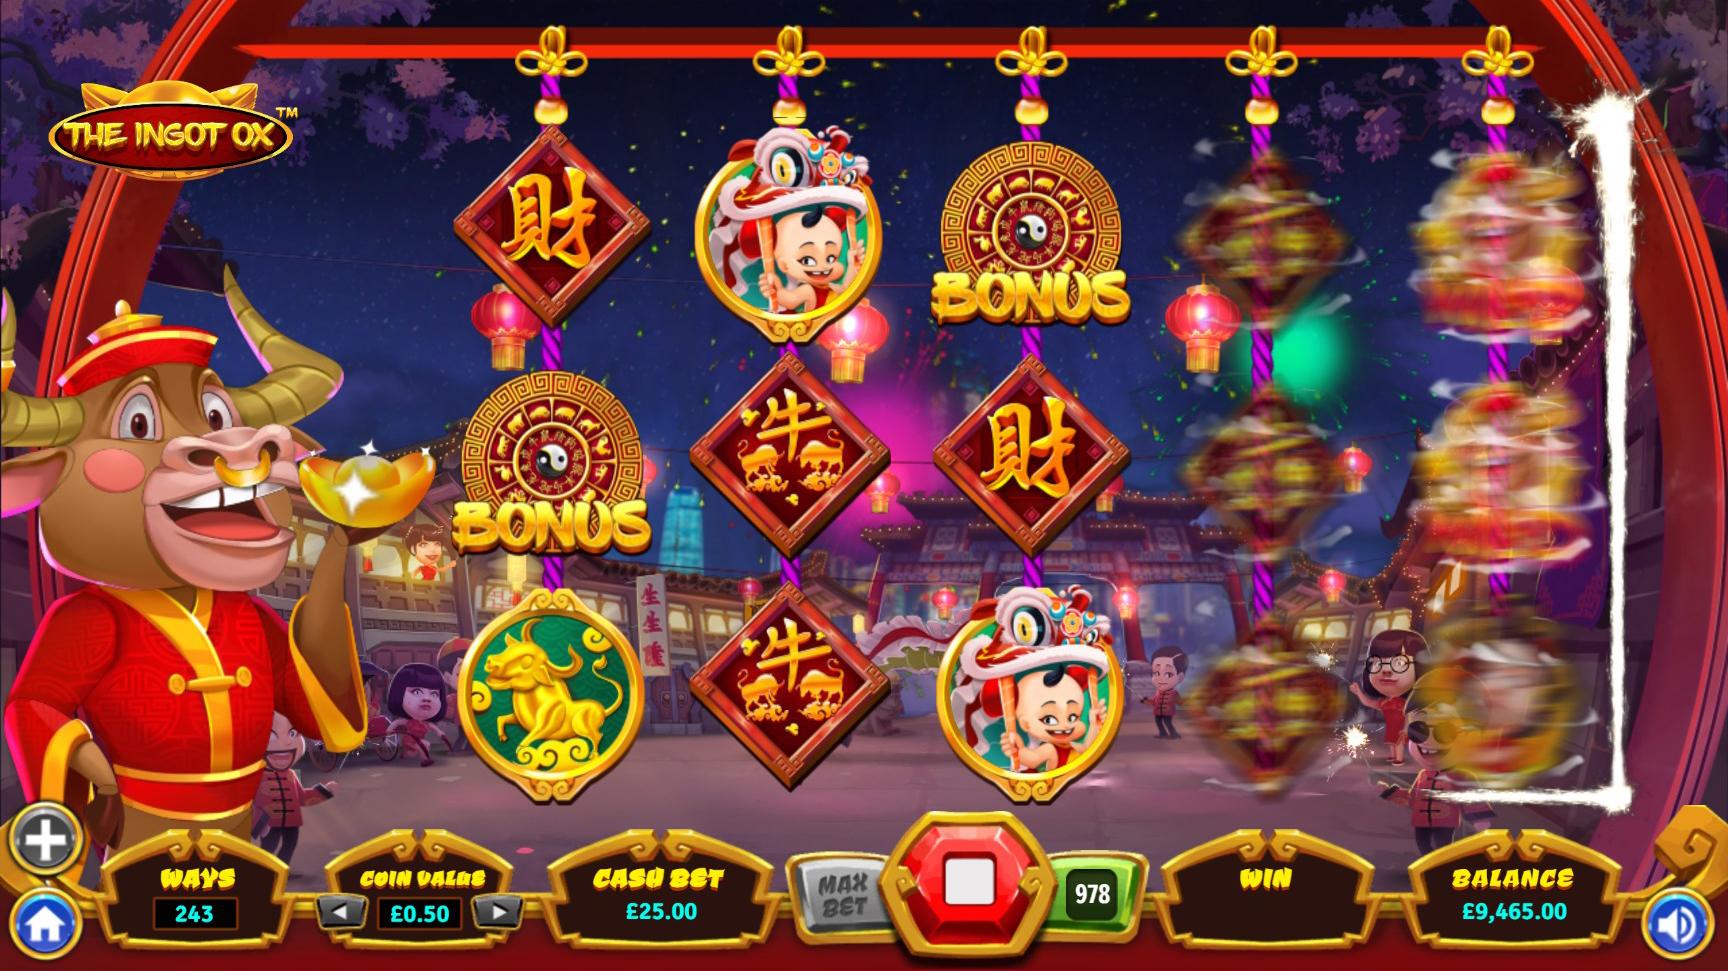 the ingot ox gameplay screenshot